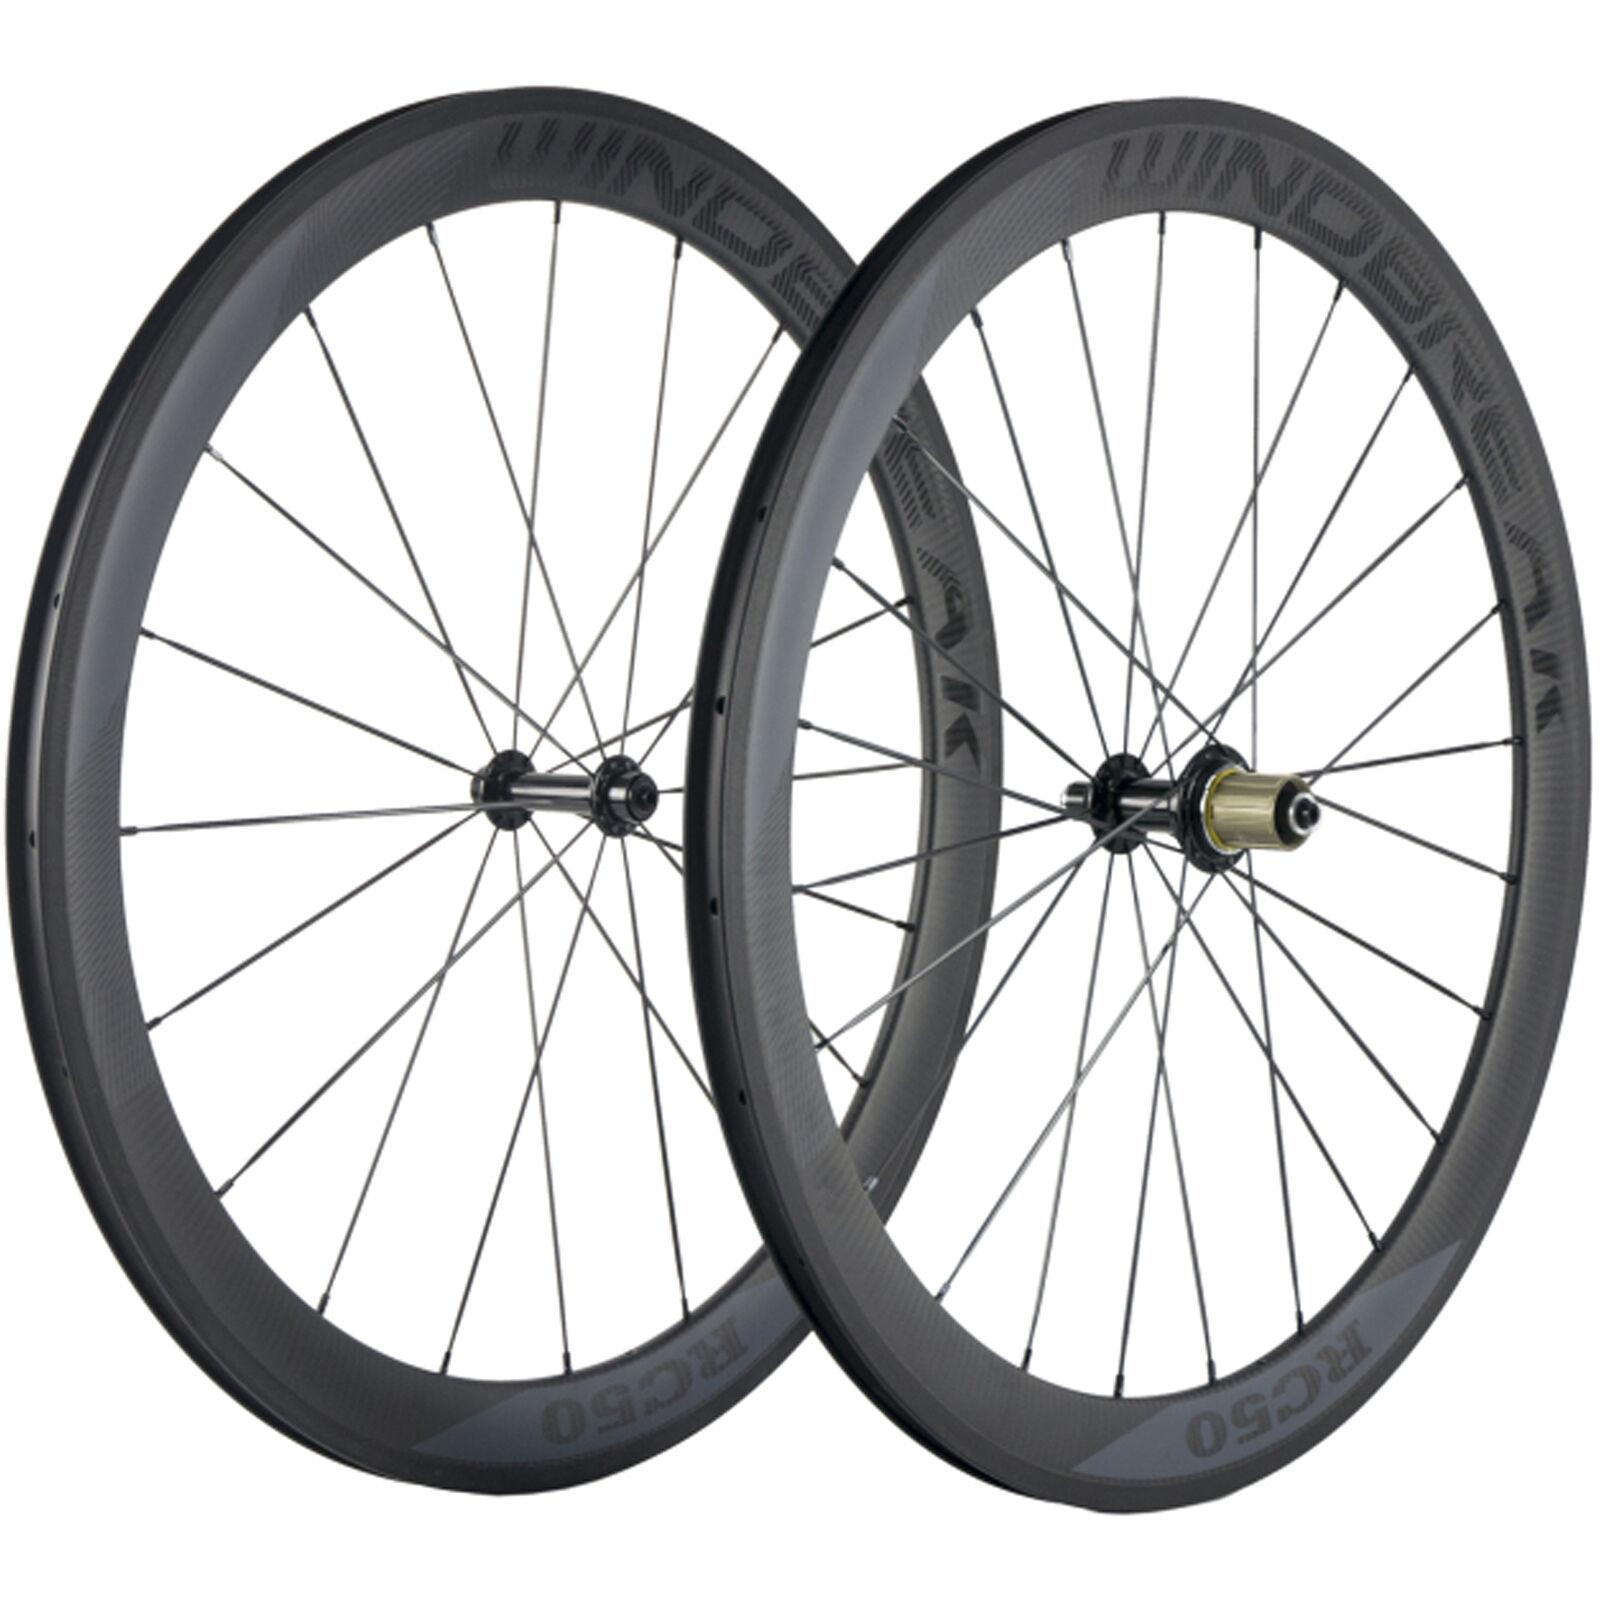 Carbon Wheels Clincher 50mm Carbon Road Bike Wheelset  R13 Matte Basalt Brake  new sadie